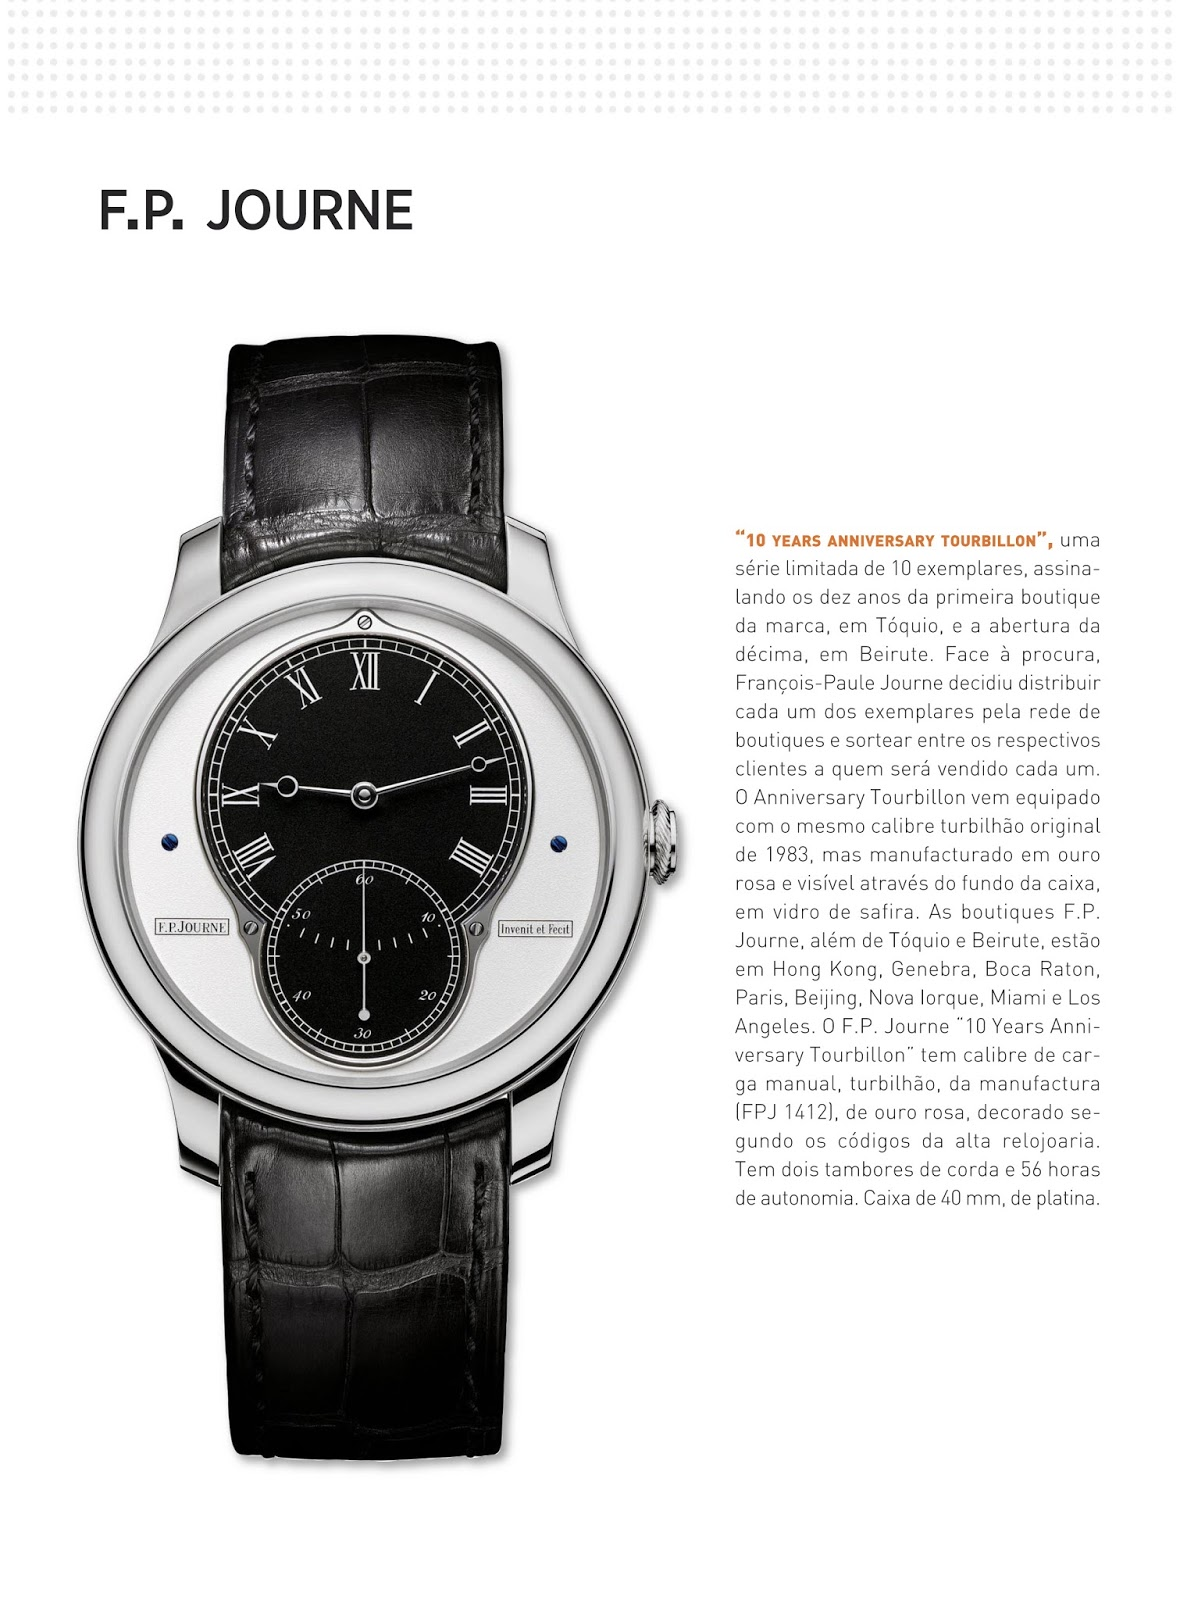 feb4914cd51 Relógios   Canetas online - relógio F.P.Journe